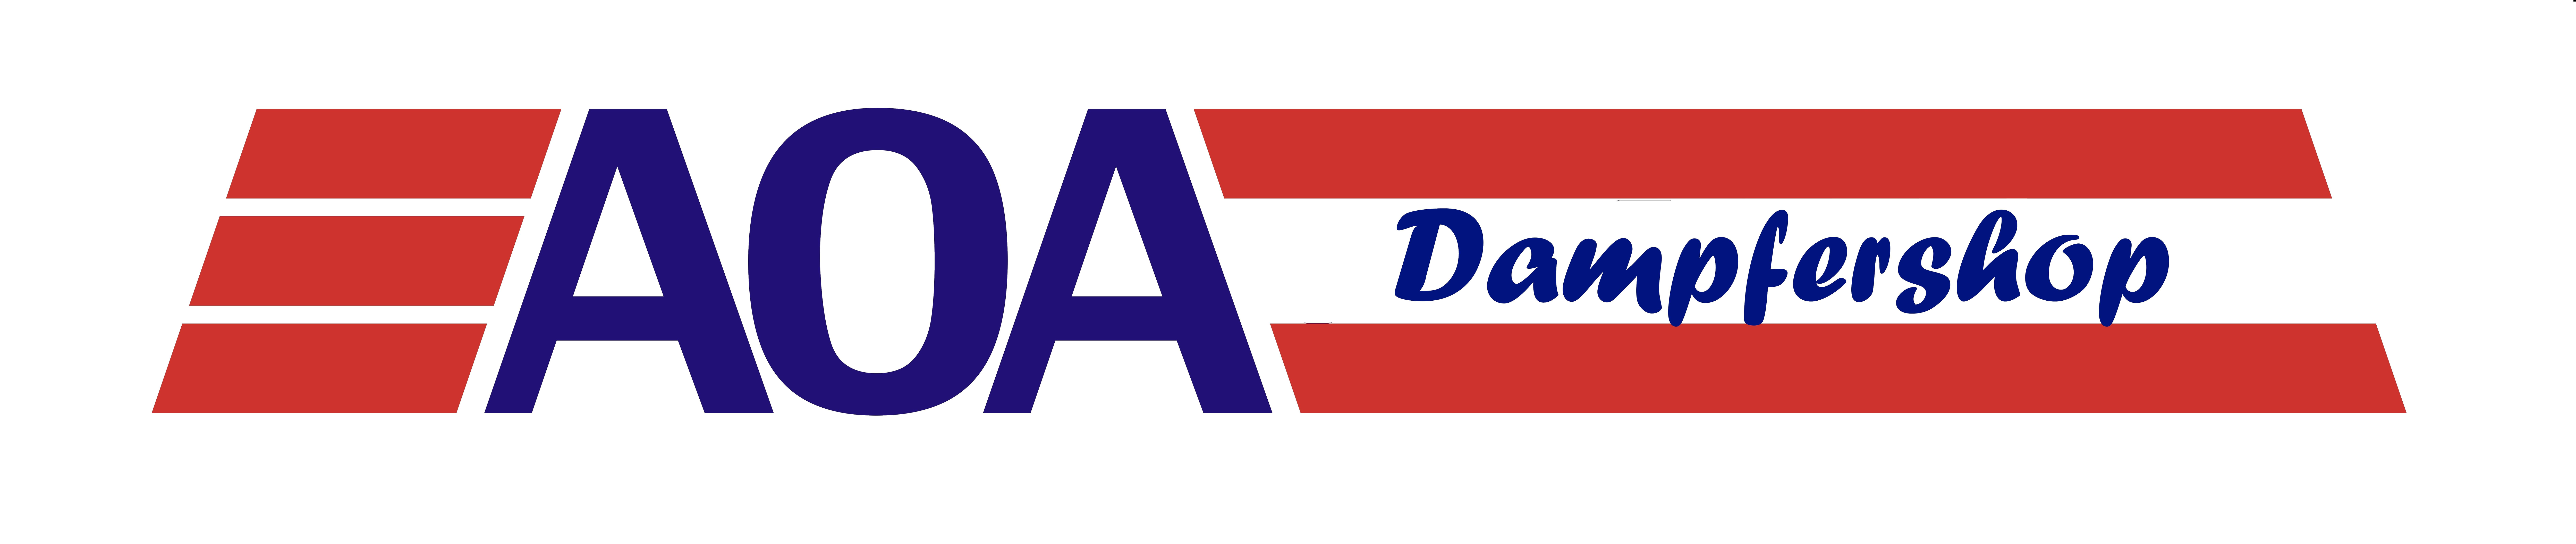 AOA Dampfershop